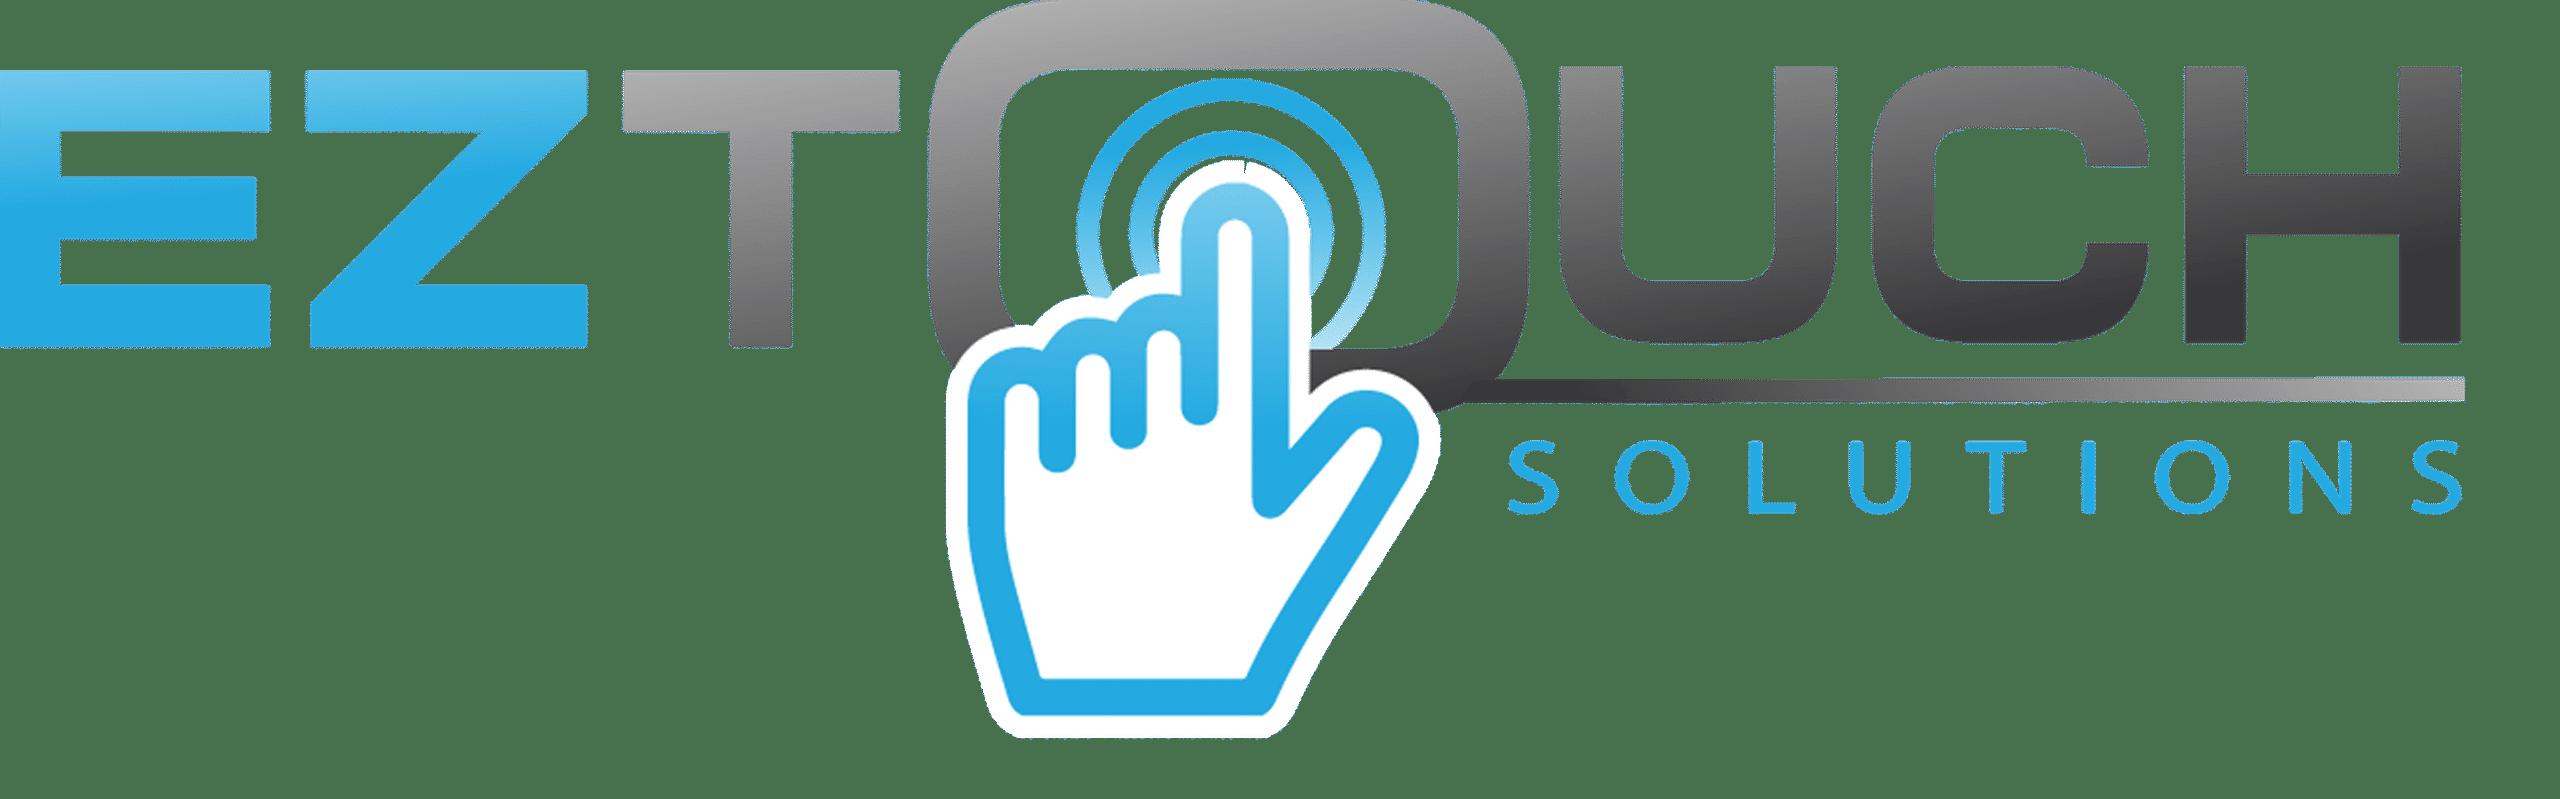 EZ Touch Solutions